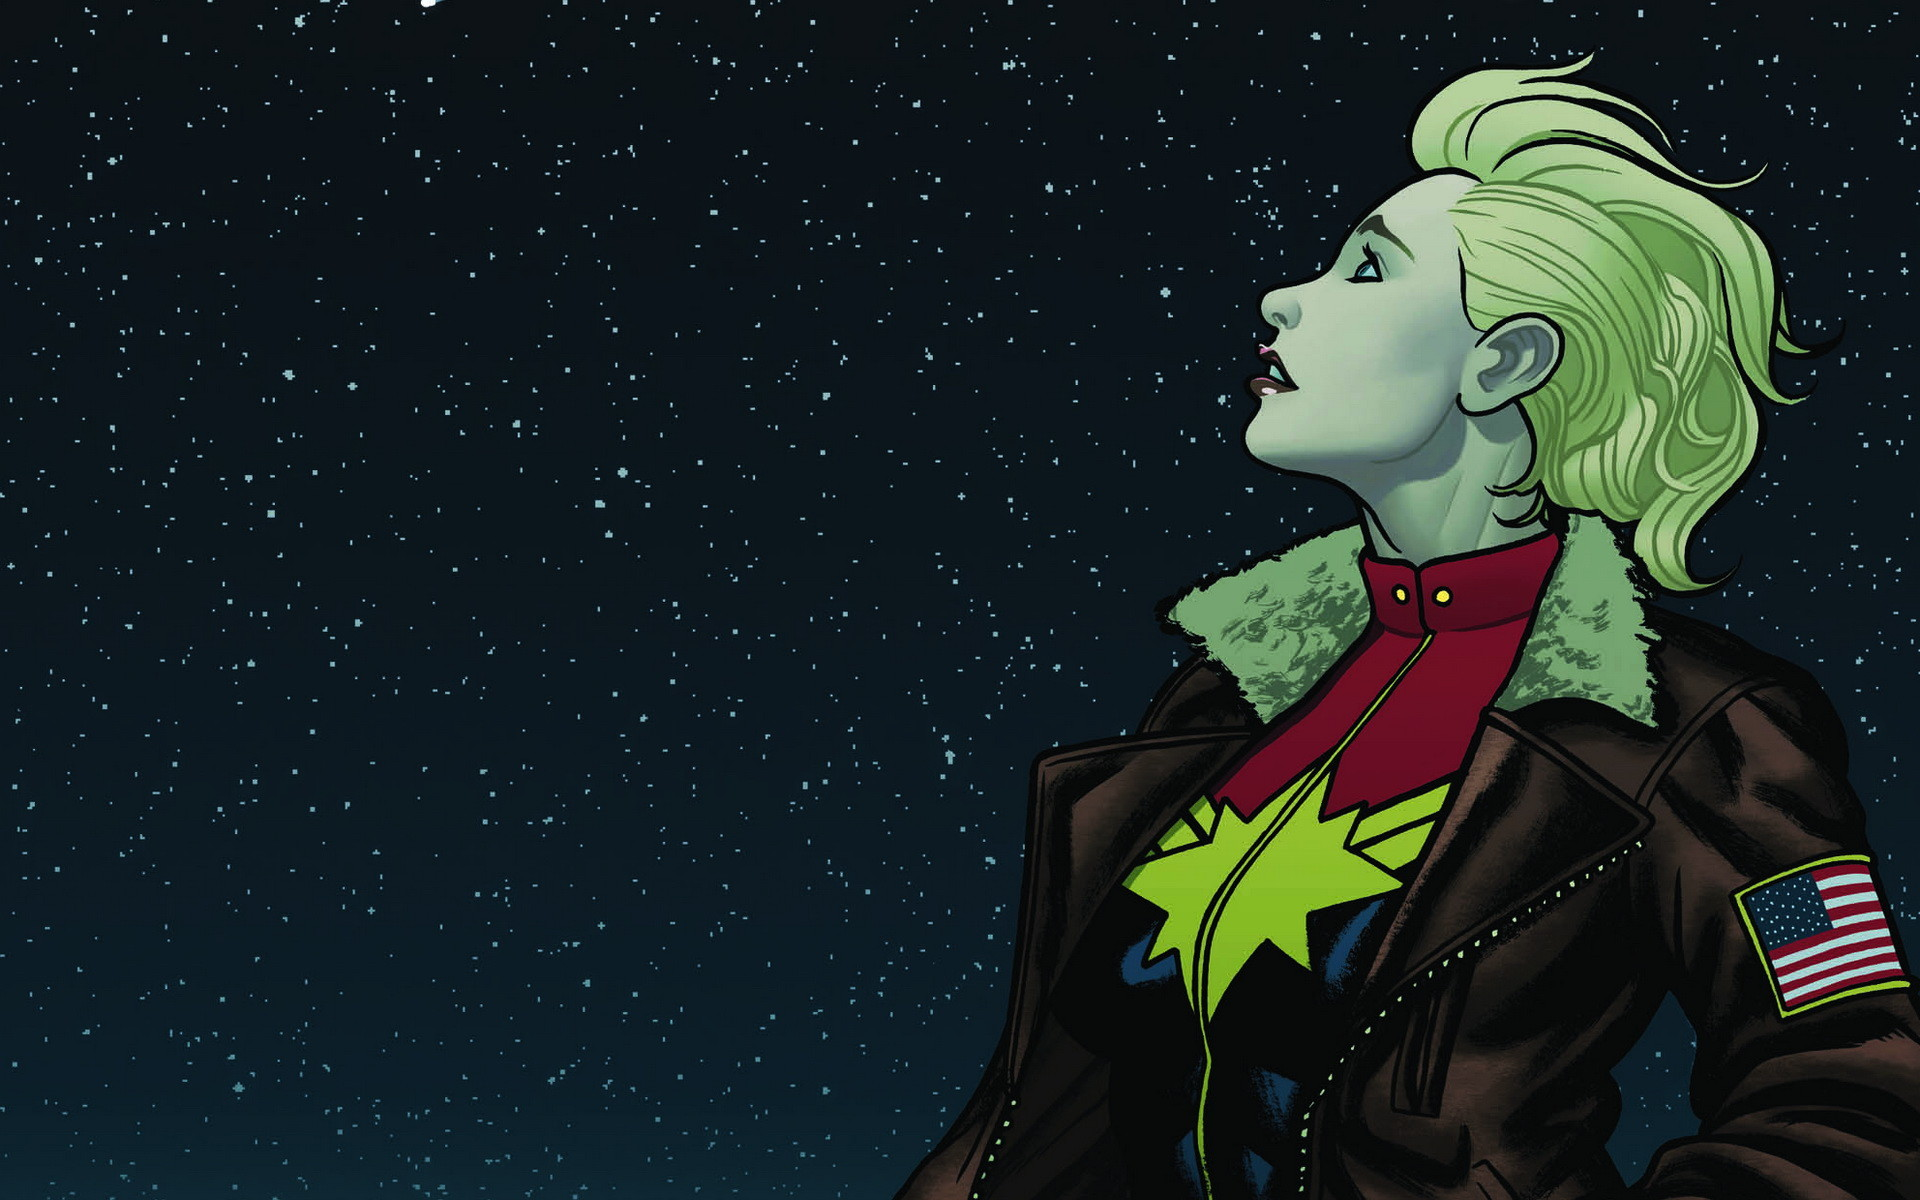 Nữ anh hùng Captain Marvel